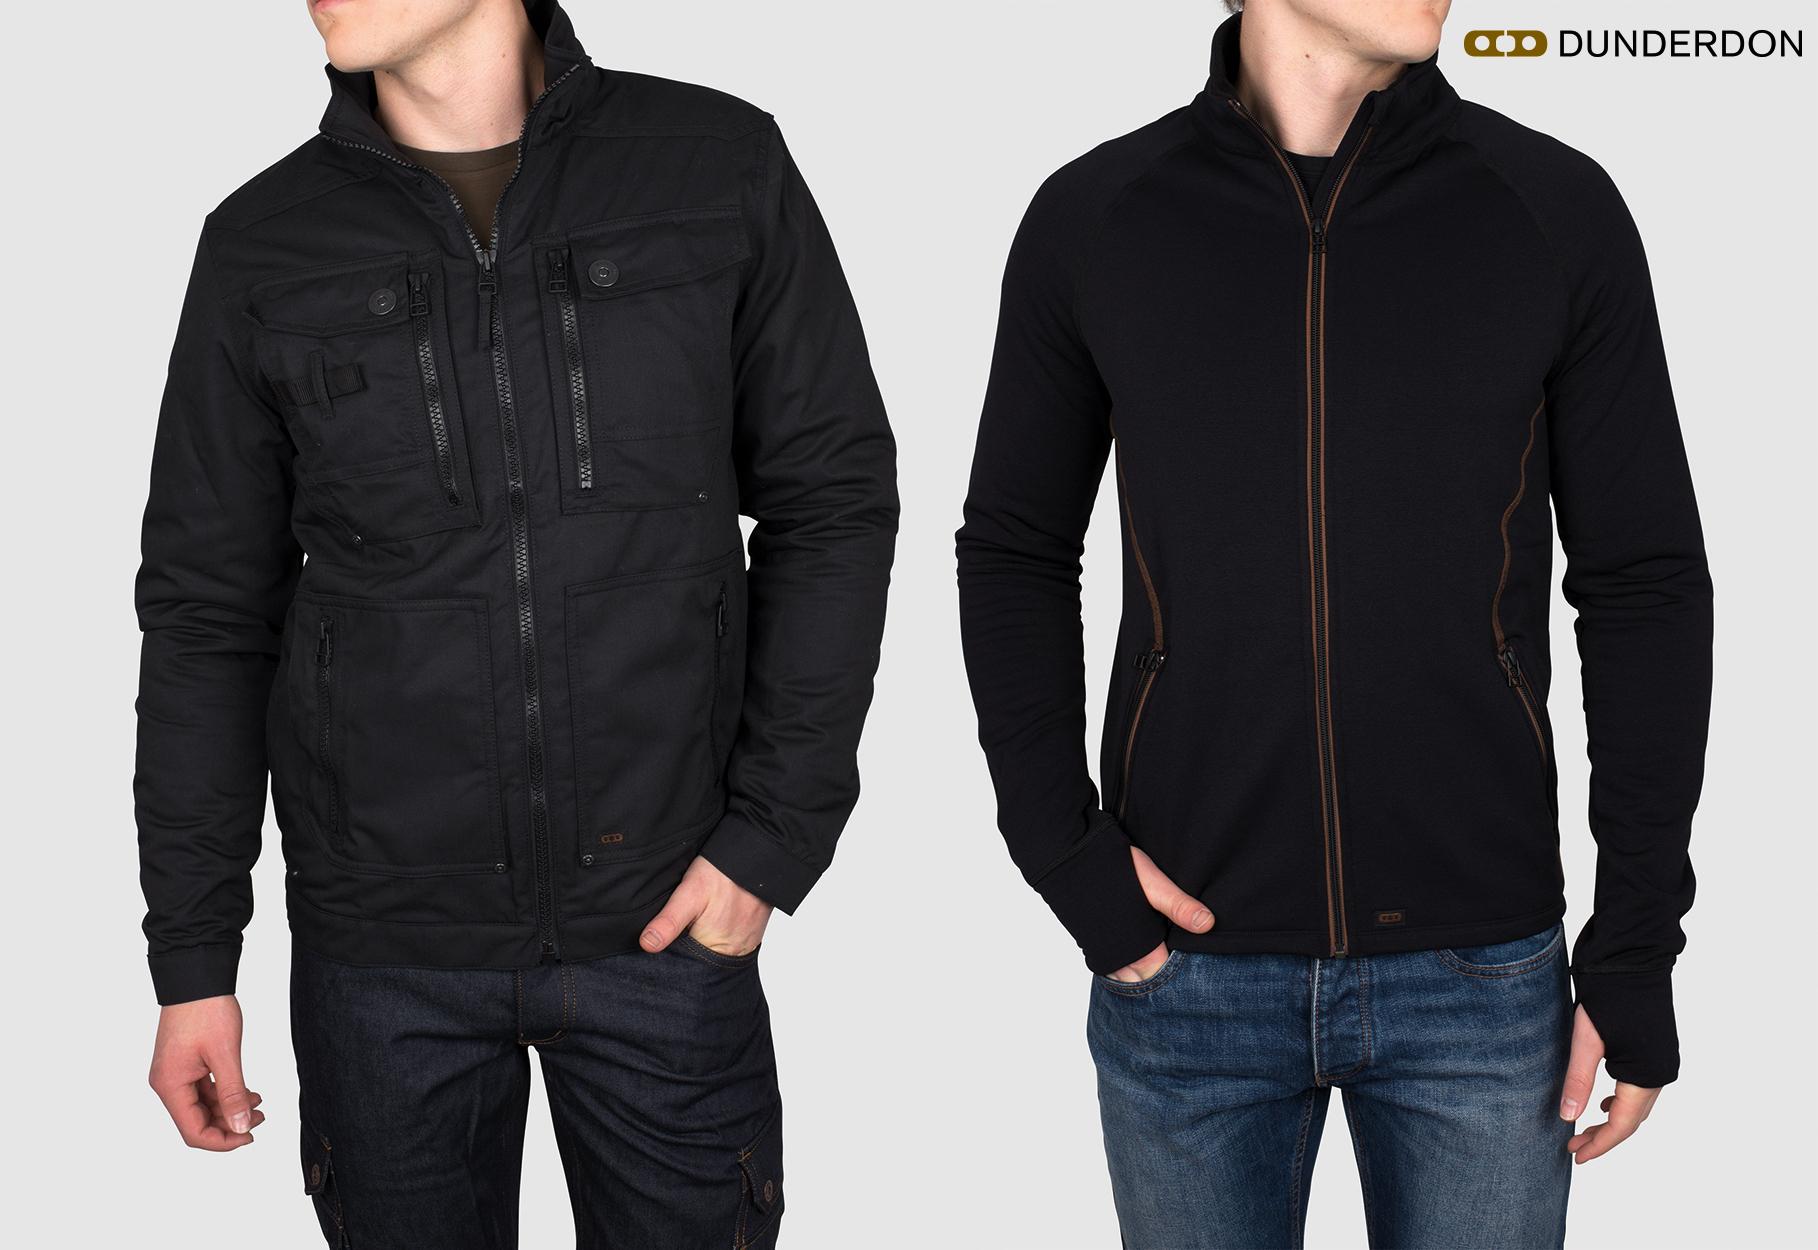 Dunderdon: the fashion workwear brand